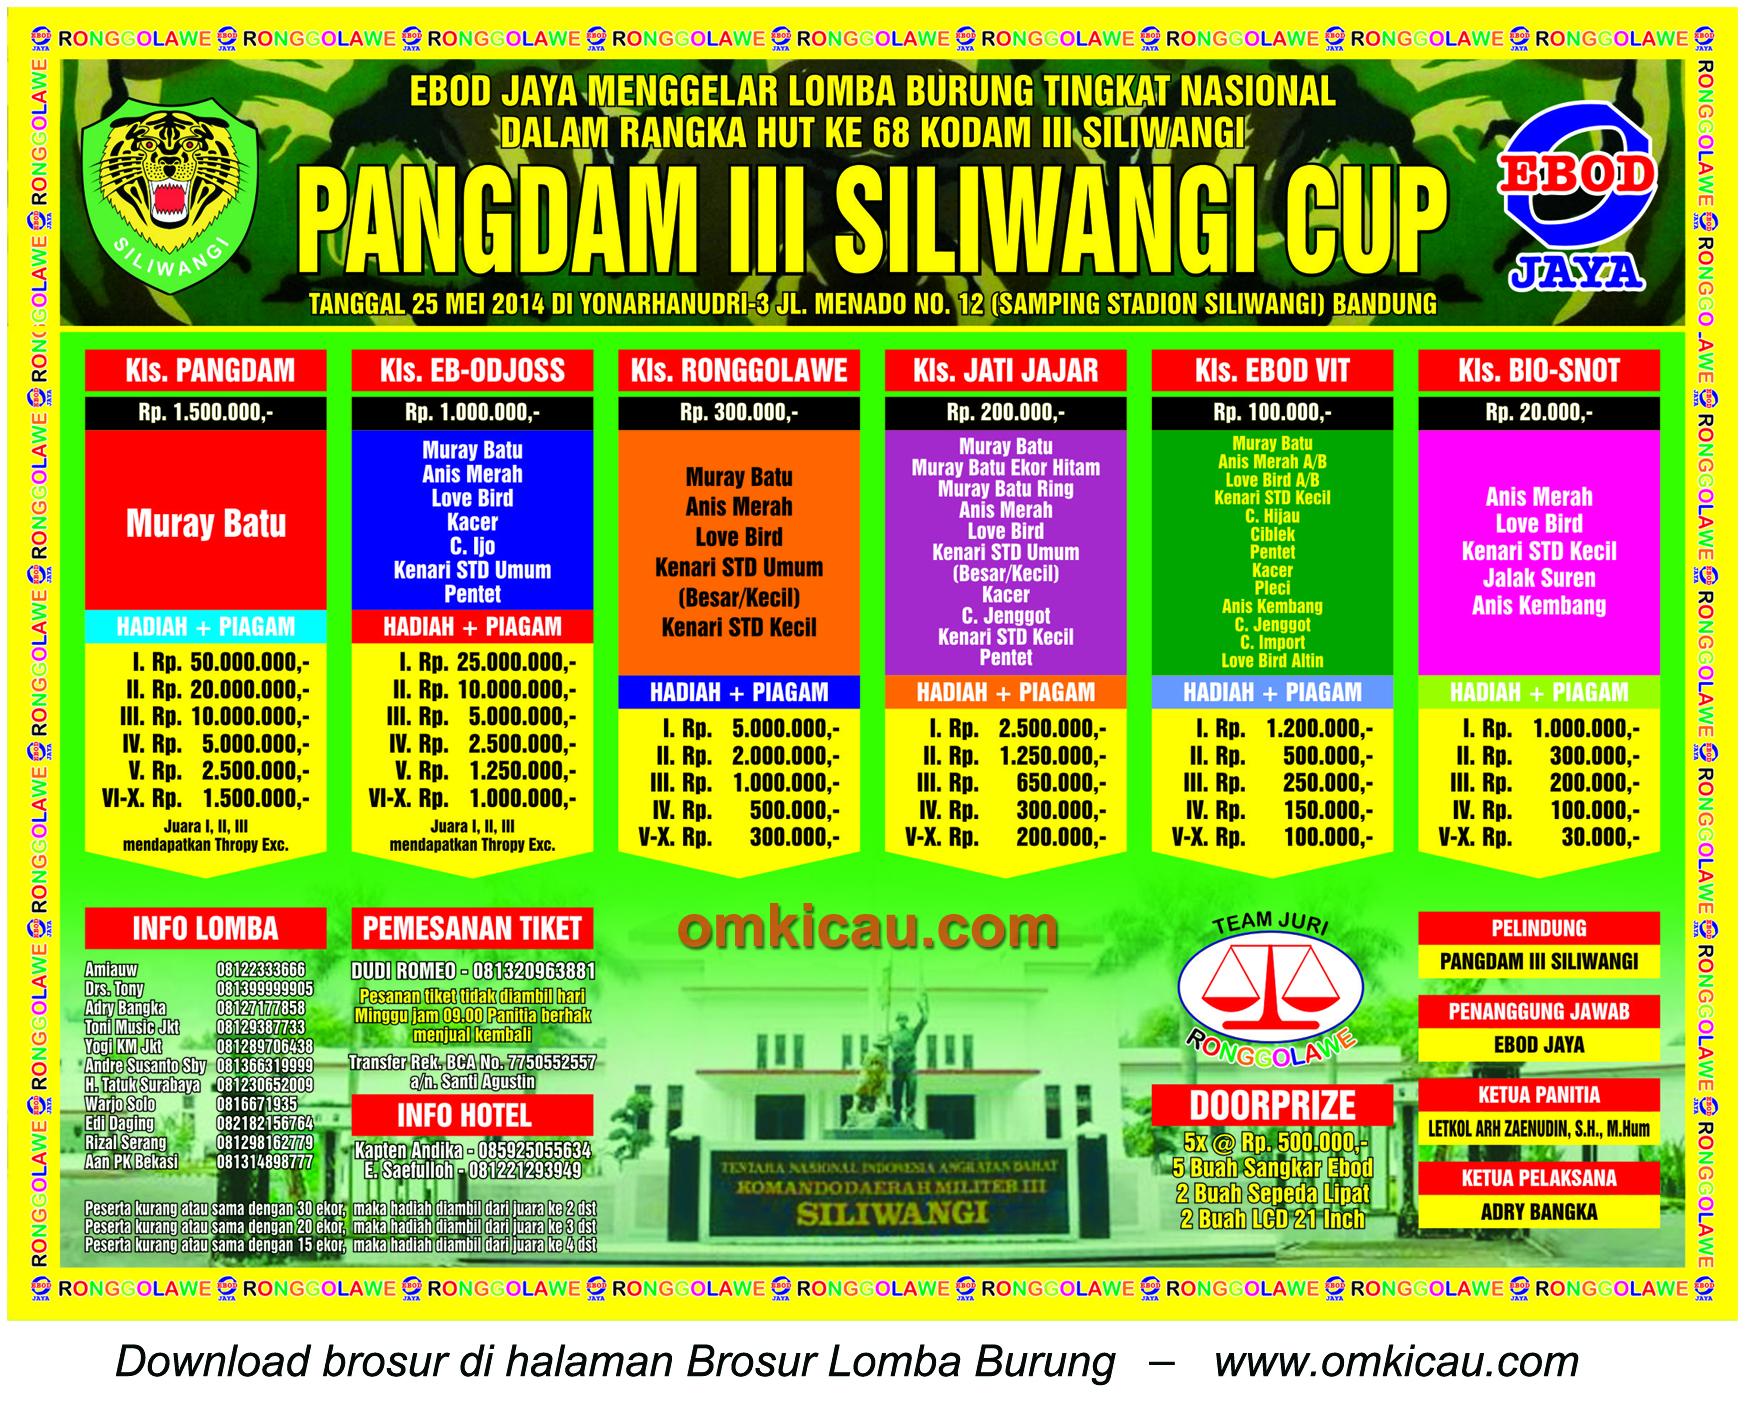 Brosur Lomba Burung Pangdam III Siliwangi Cup, Bandung, 25 Mei 2014